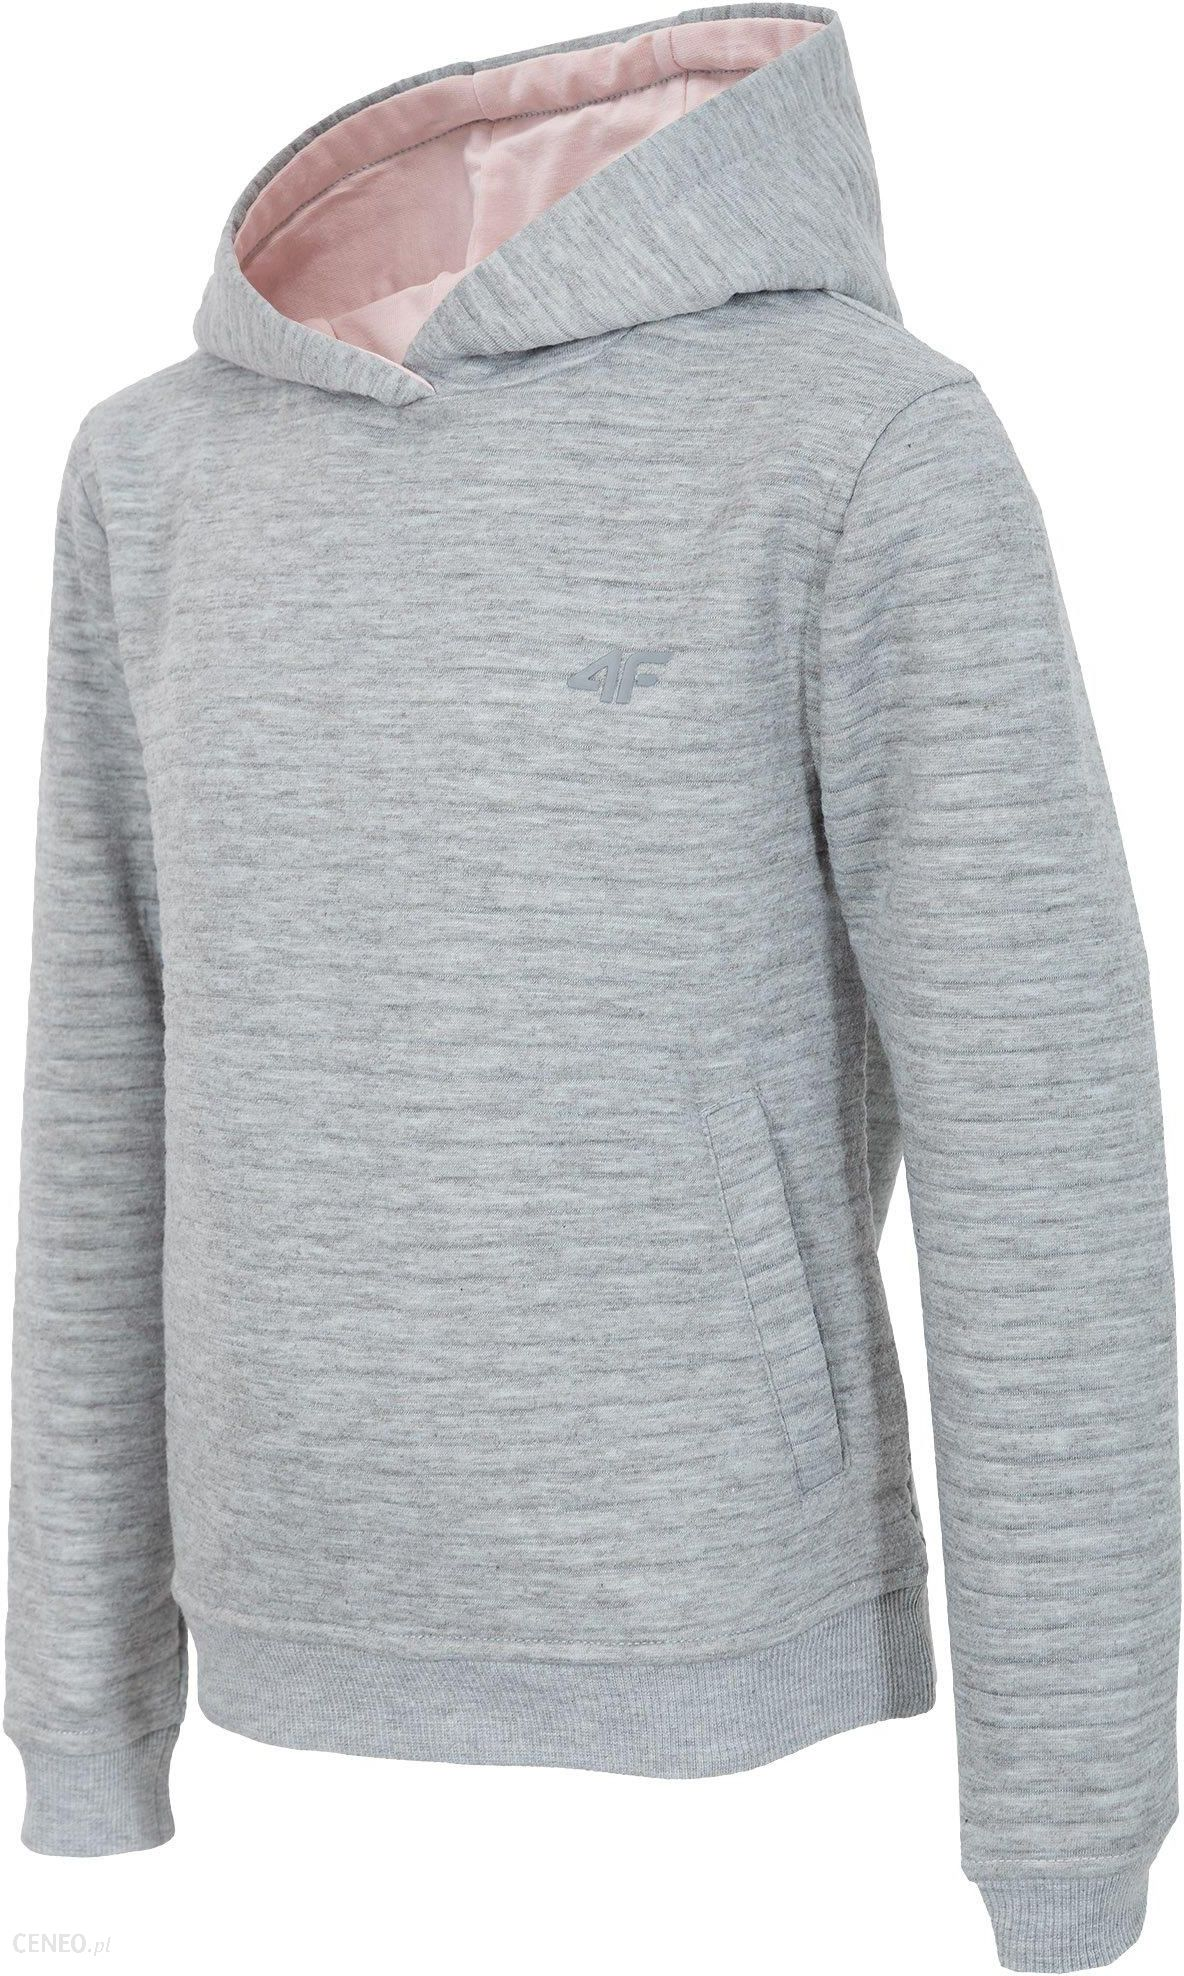 puma bluza szara 122cm